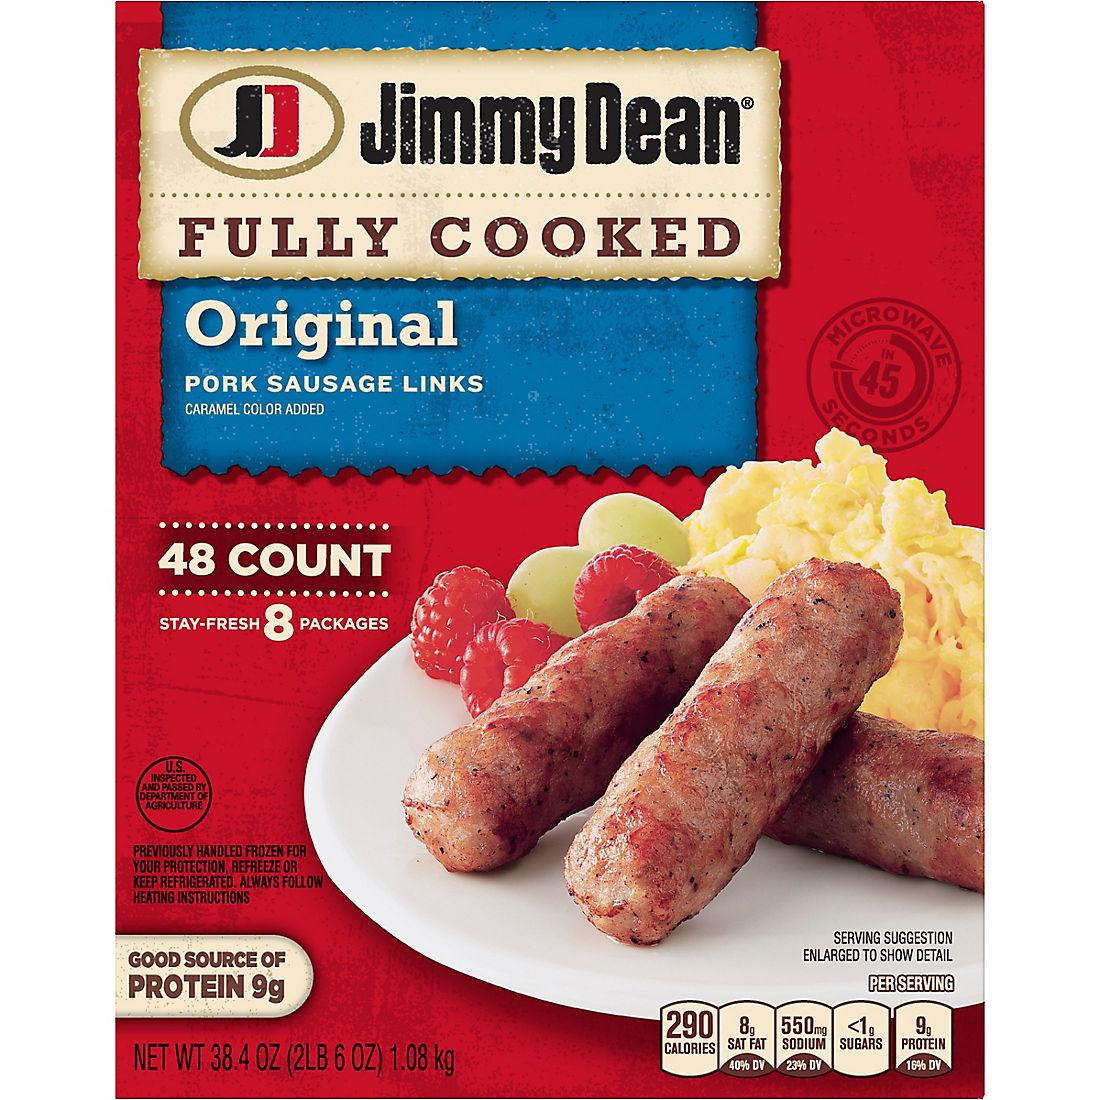 Jimmy Dean Fully Cooked Original Pork Sausage Links, 48 ct